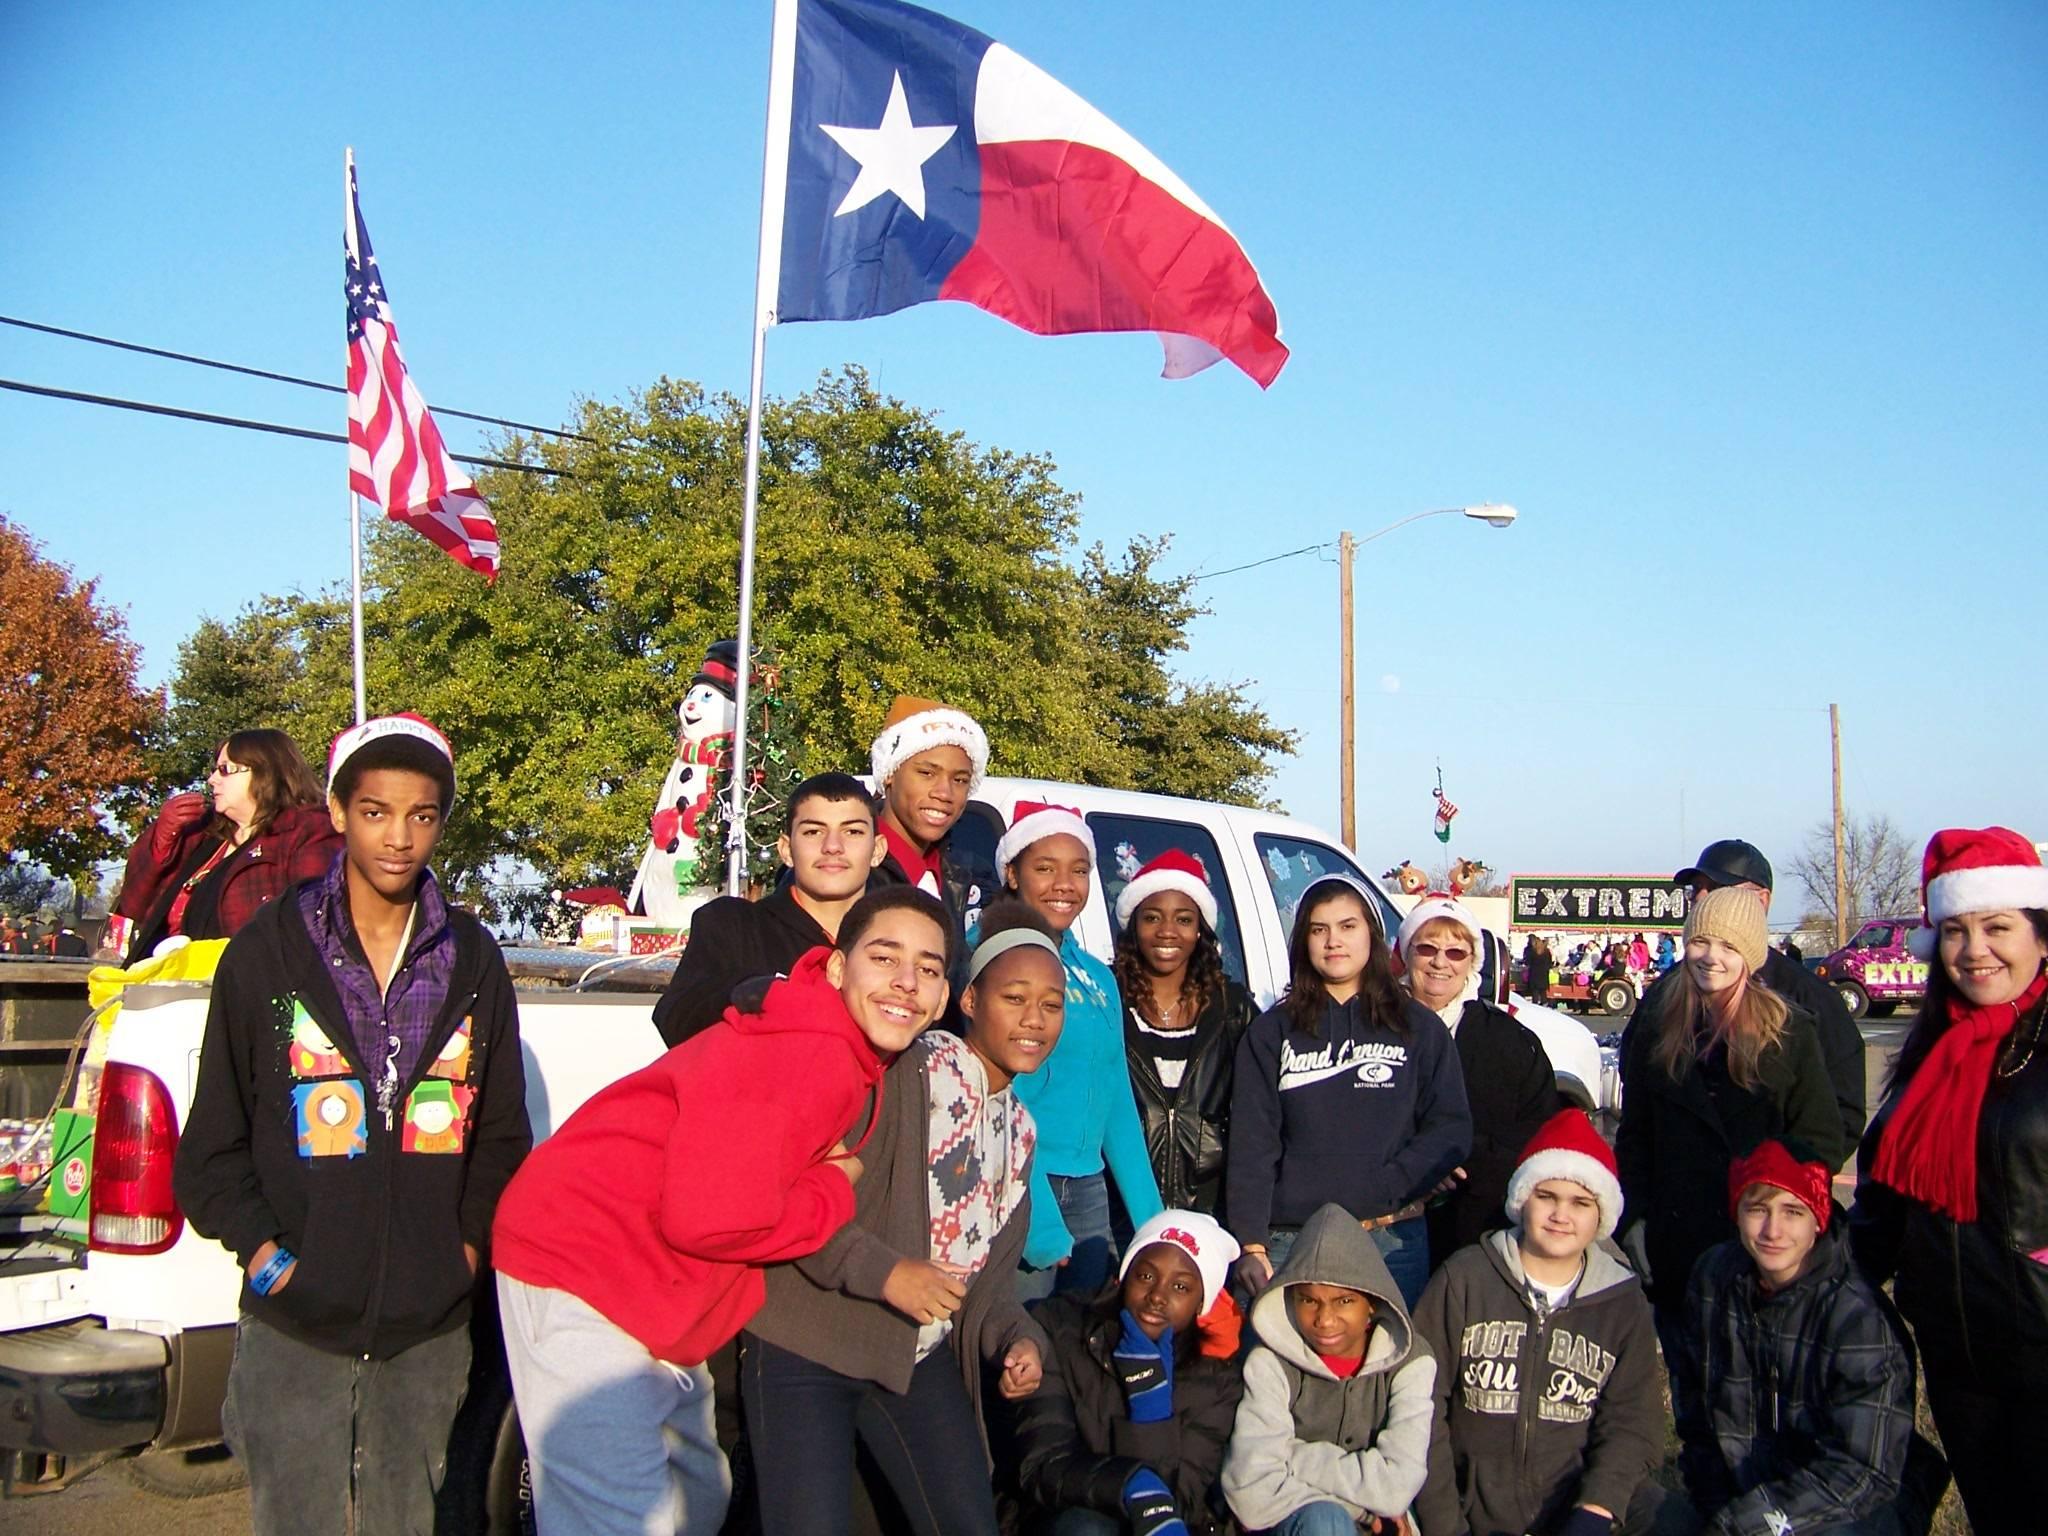 2013 Killeen Christmas parade